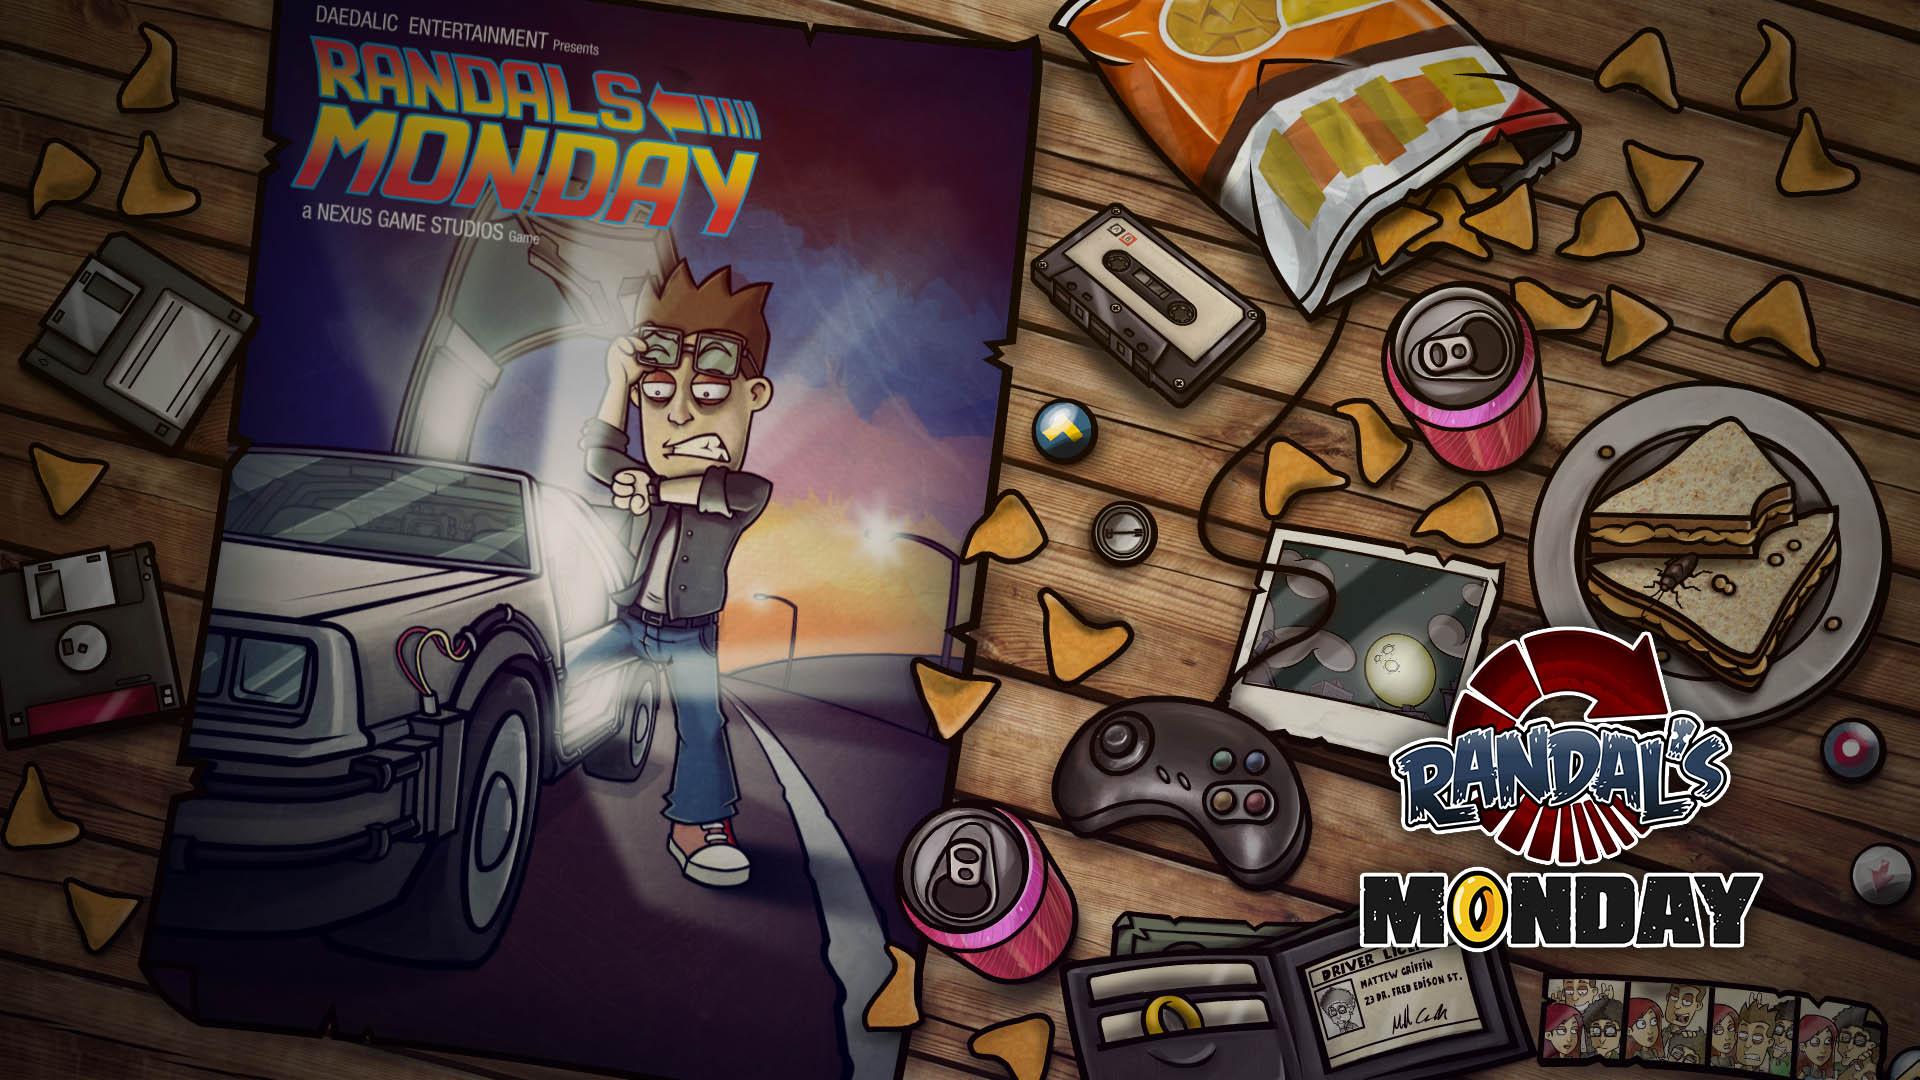 image randals monday artwork 4 jpg steam trading cards wiki